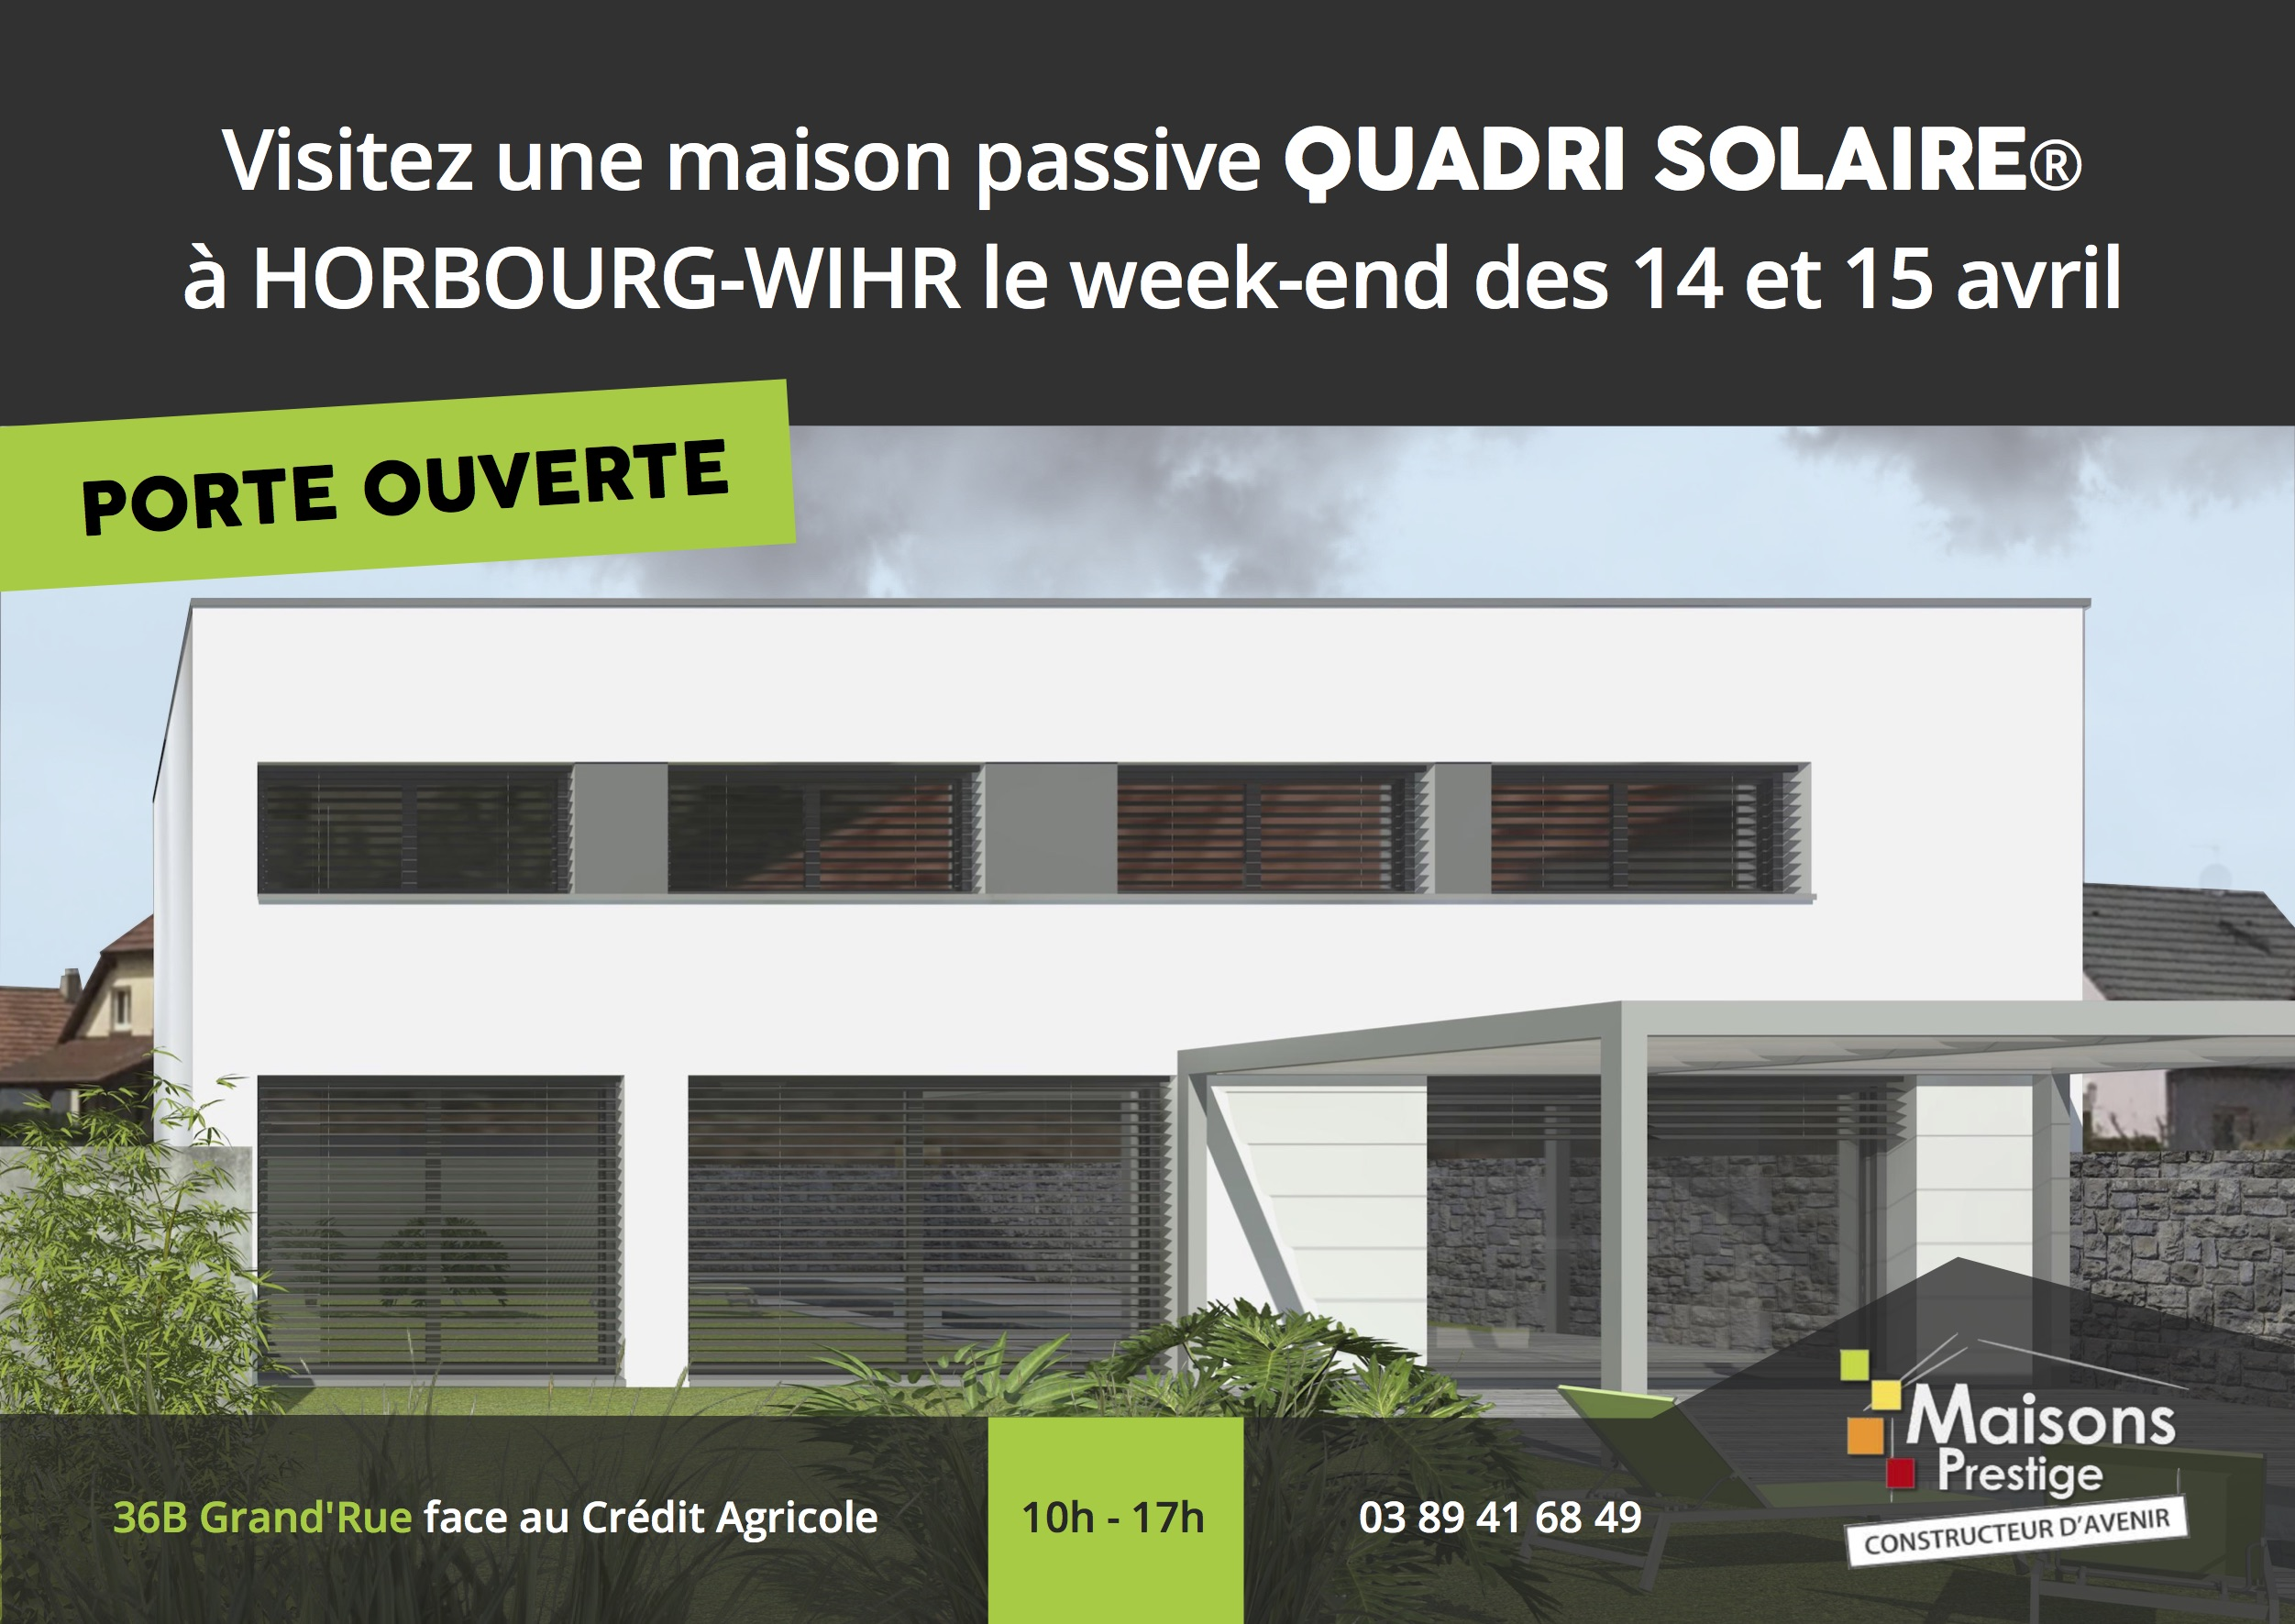 Porte ouverte maison passive quadri solaire 14 15 avril for Porte ouverte maison